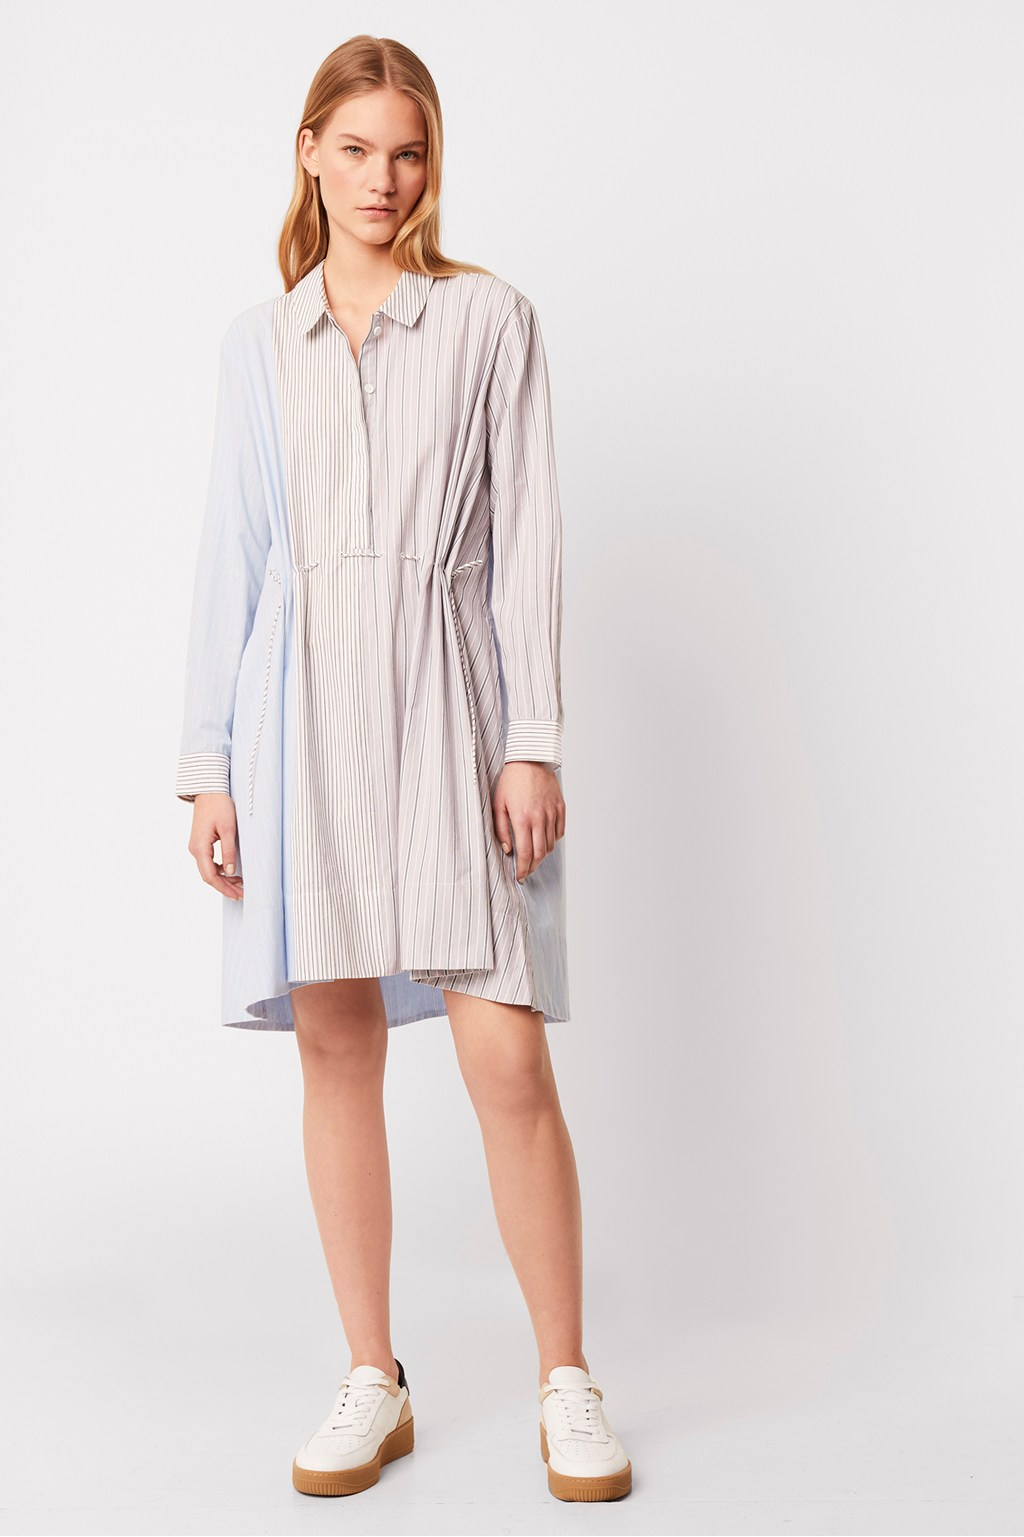 French Connection Salma Stripe Oversized Shirt Dress